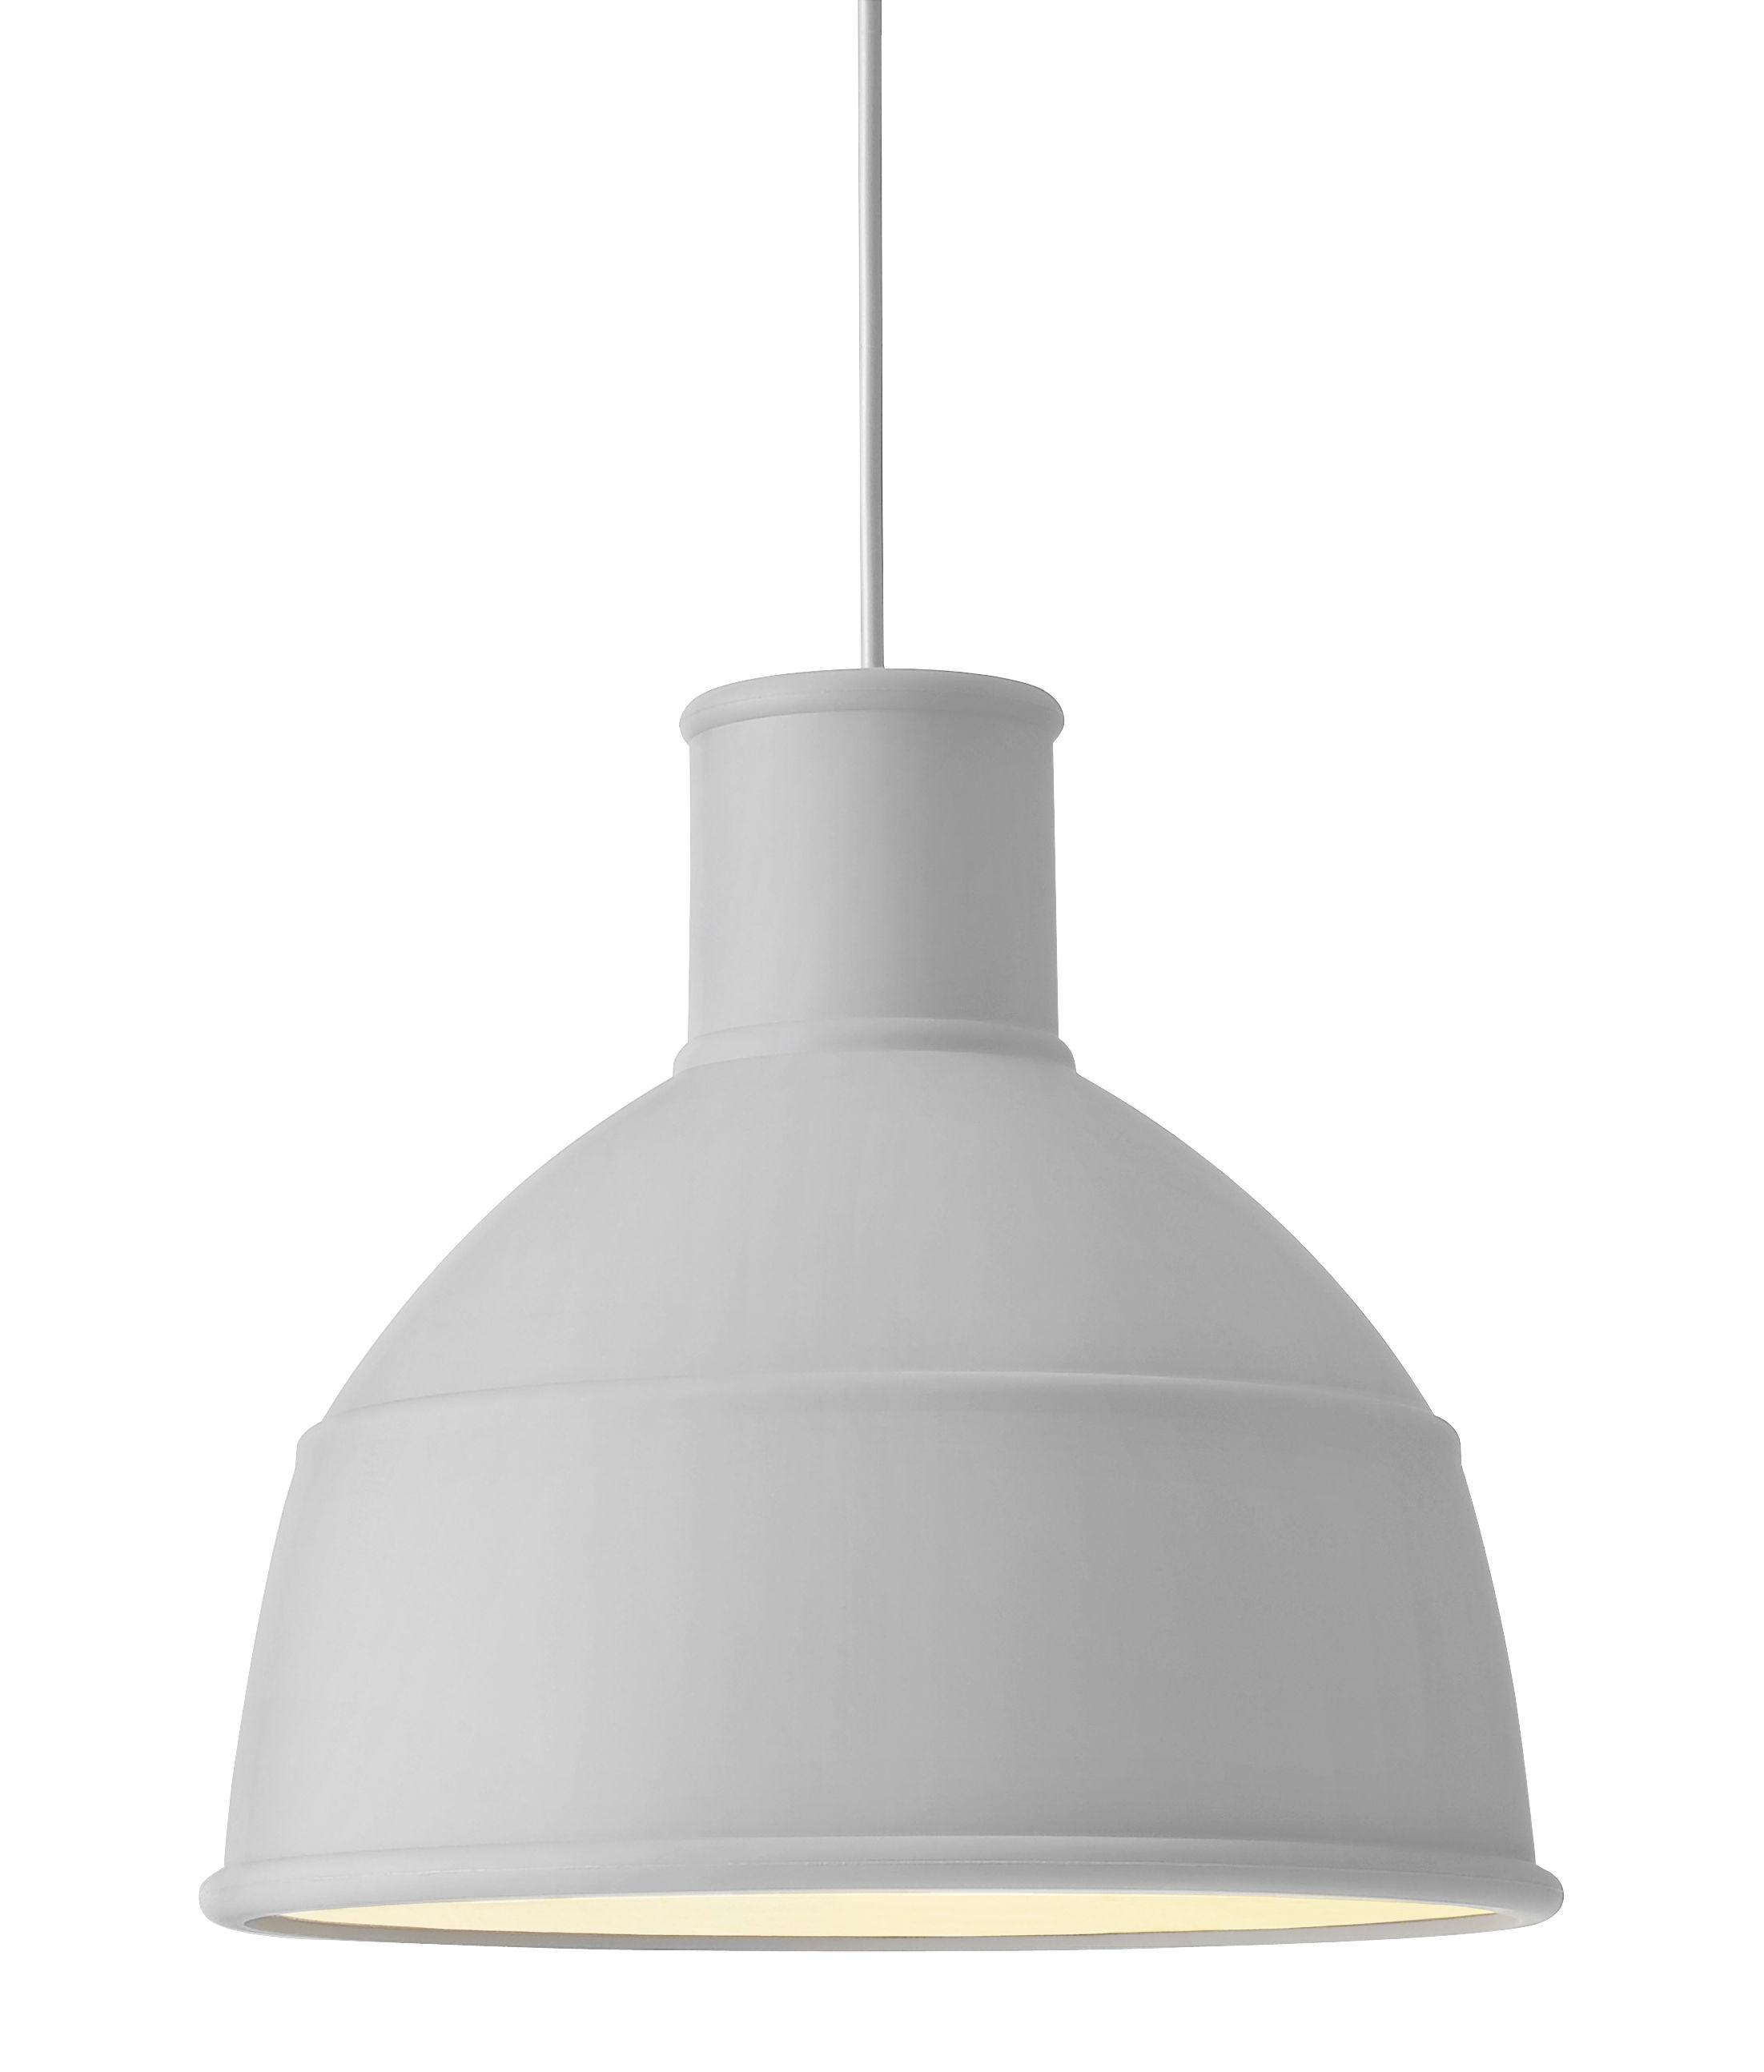 Lighting - Pendant Lighting - Unfold Pendant - Silicone by Muuto - Light grey - Silicone